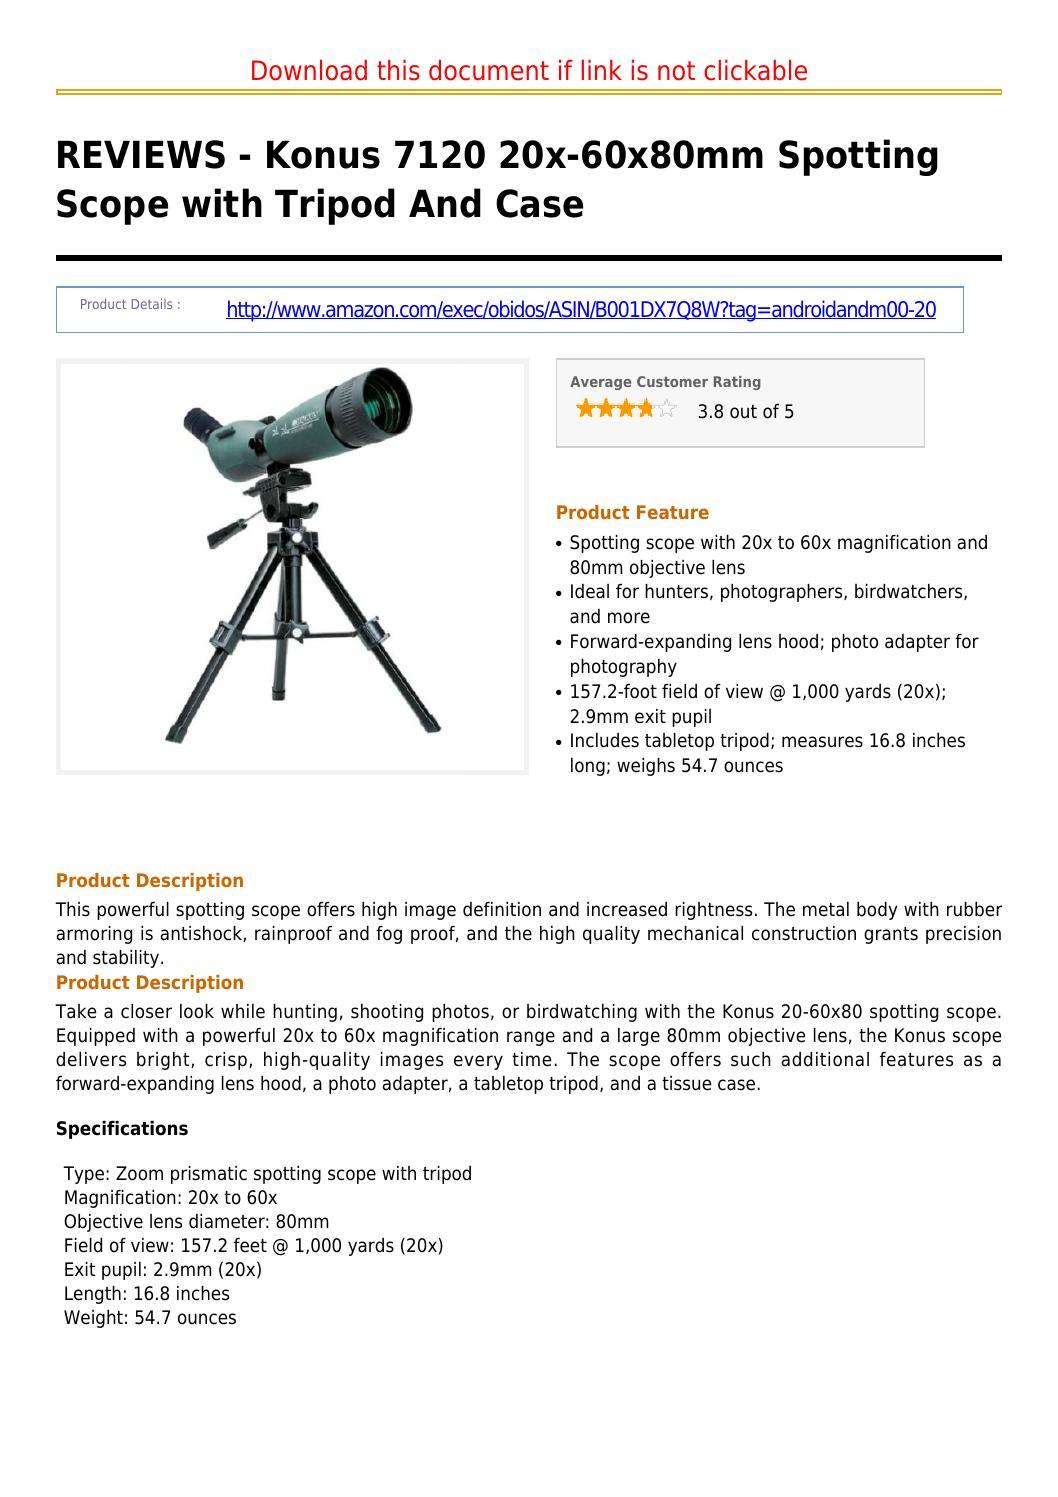 konus spotting scope 20 60x 80mm review